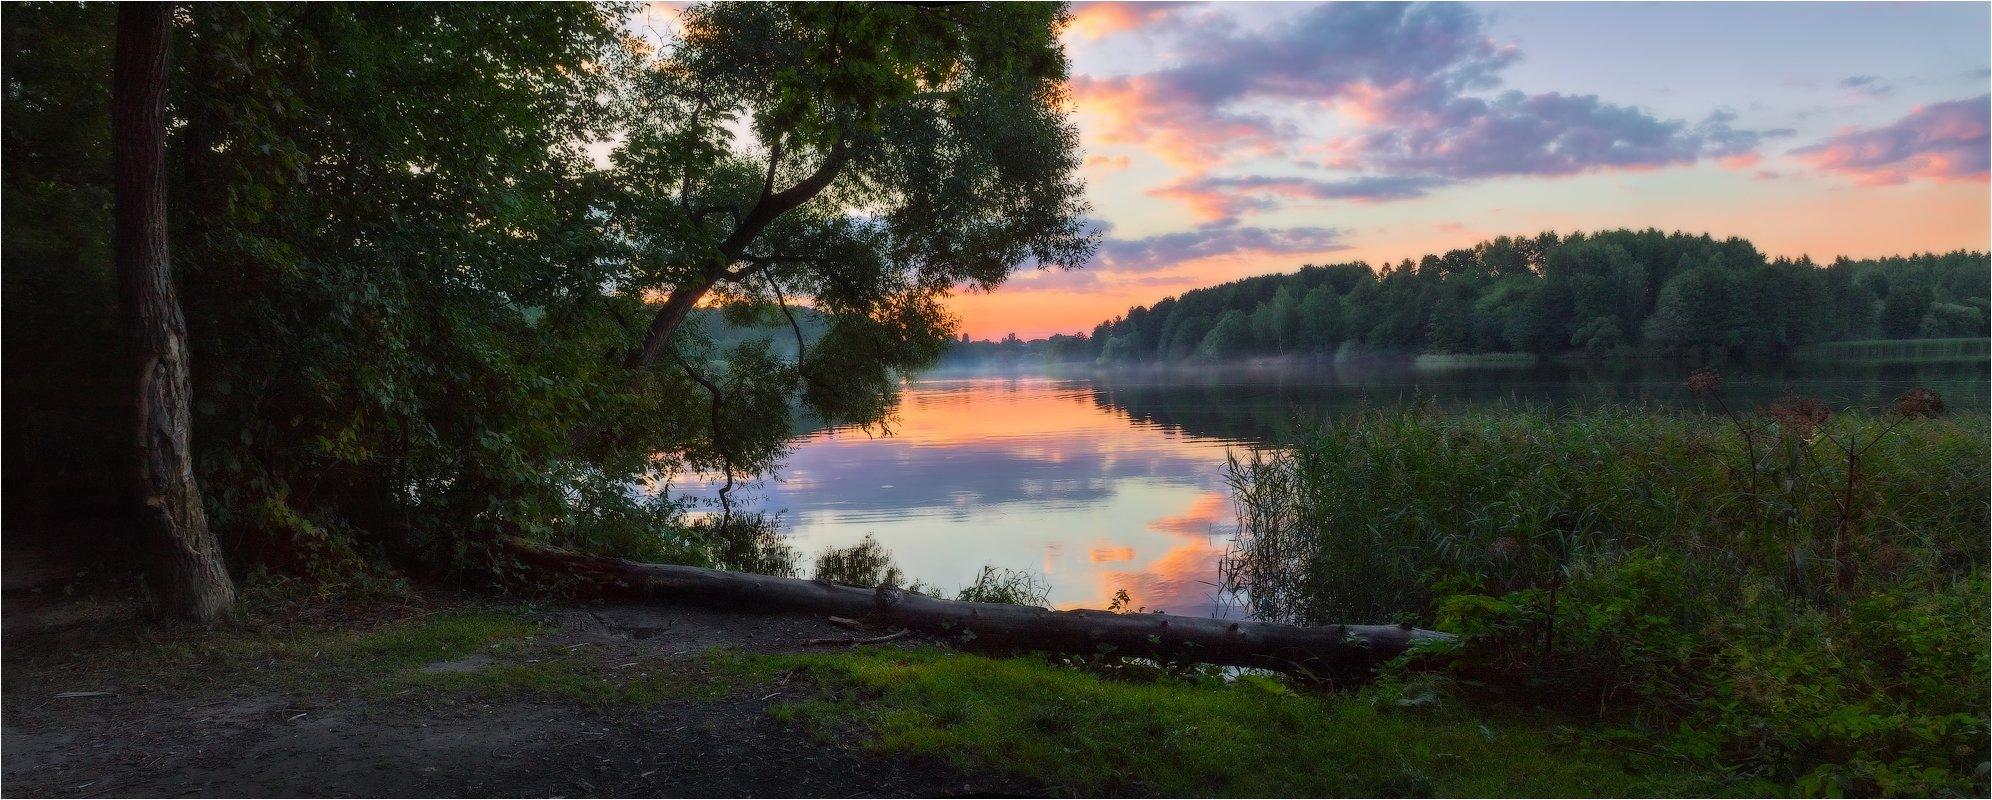 август, закат, лето, река птичь, Сергей Шабуневич